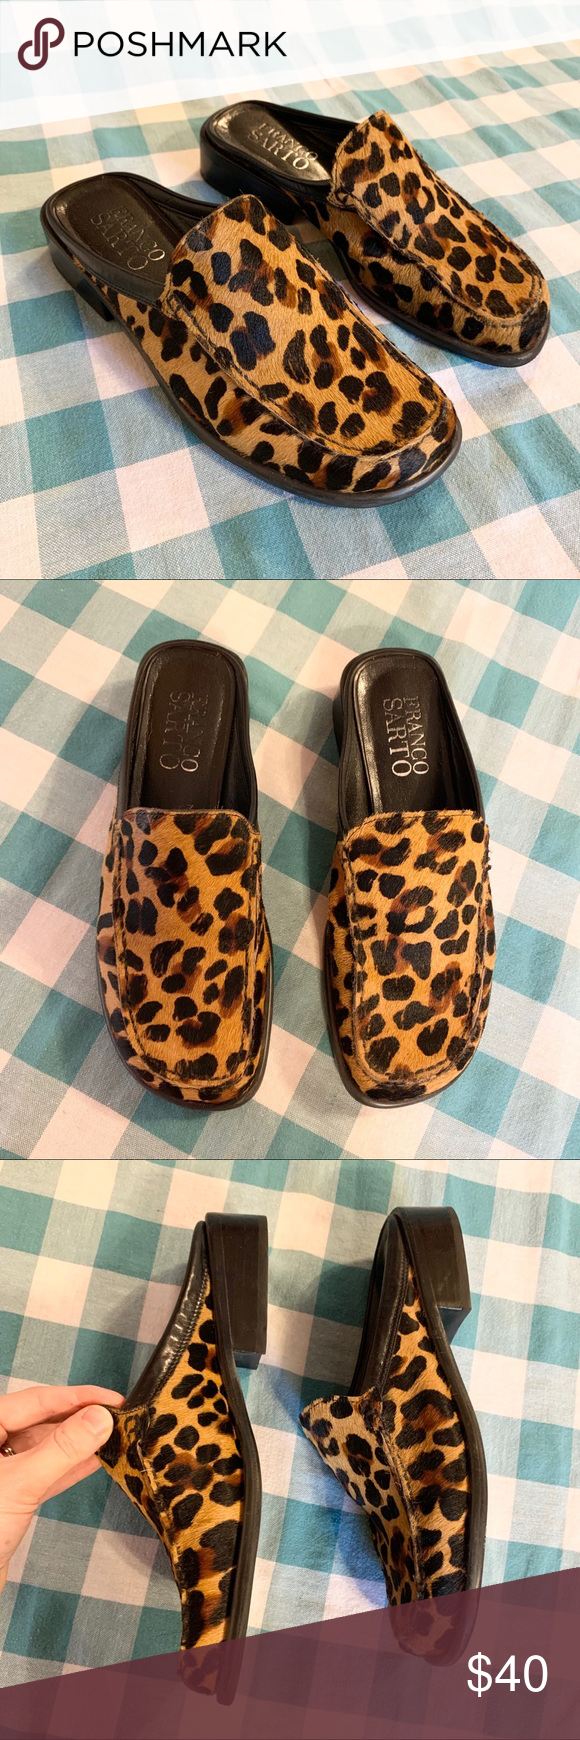 Franco Sarto Leopard Calf Hair Square